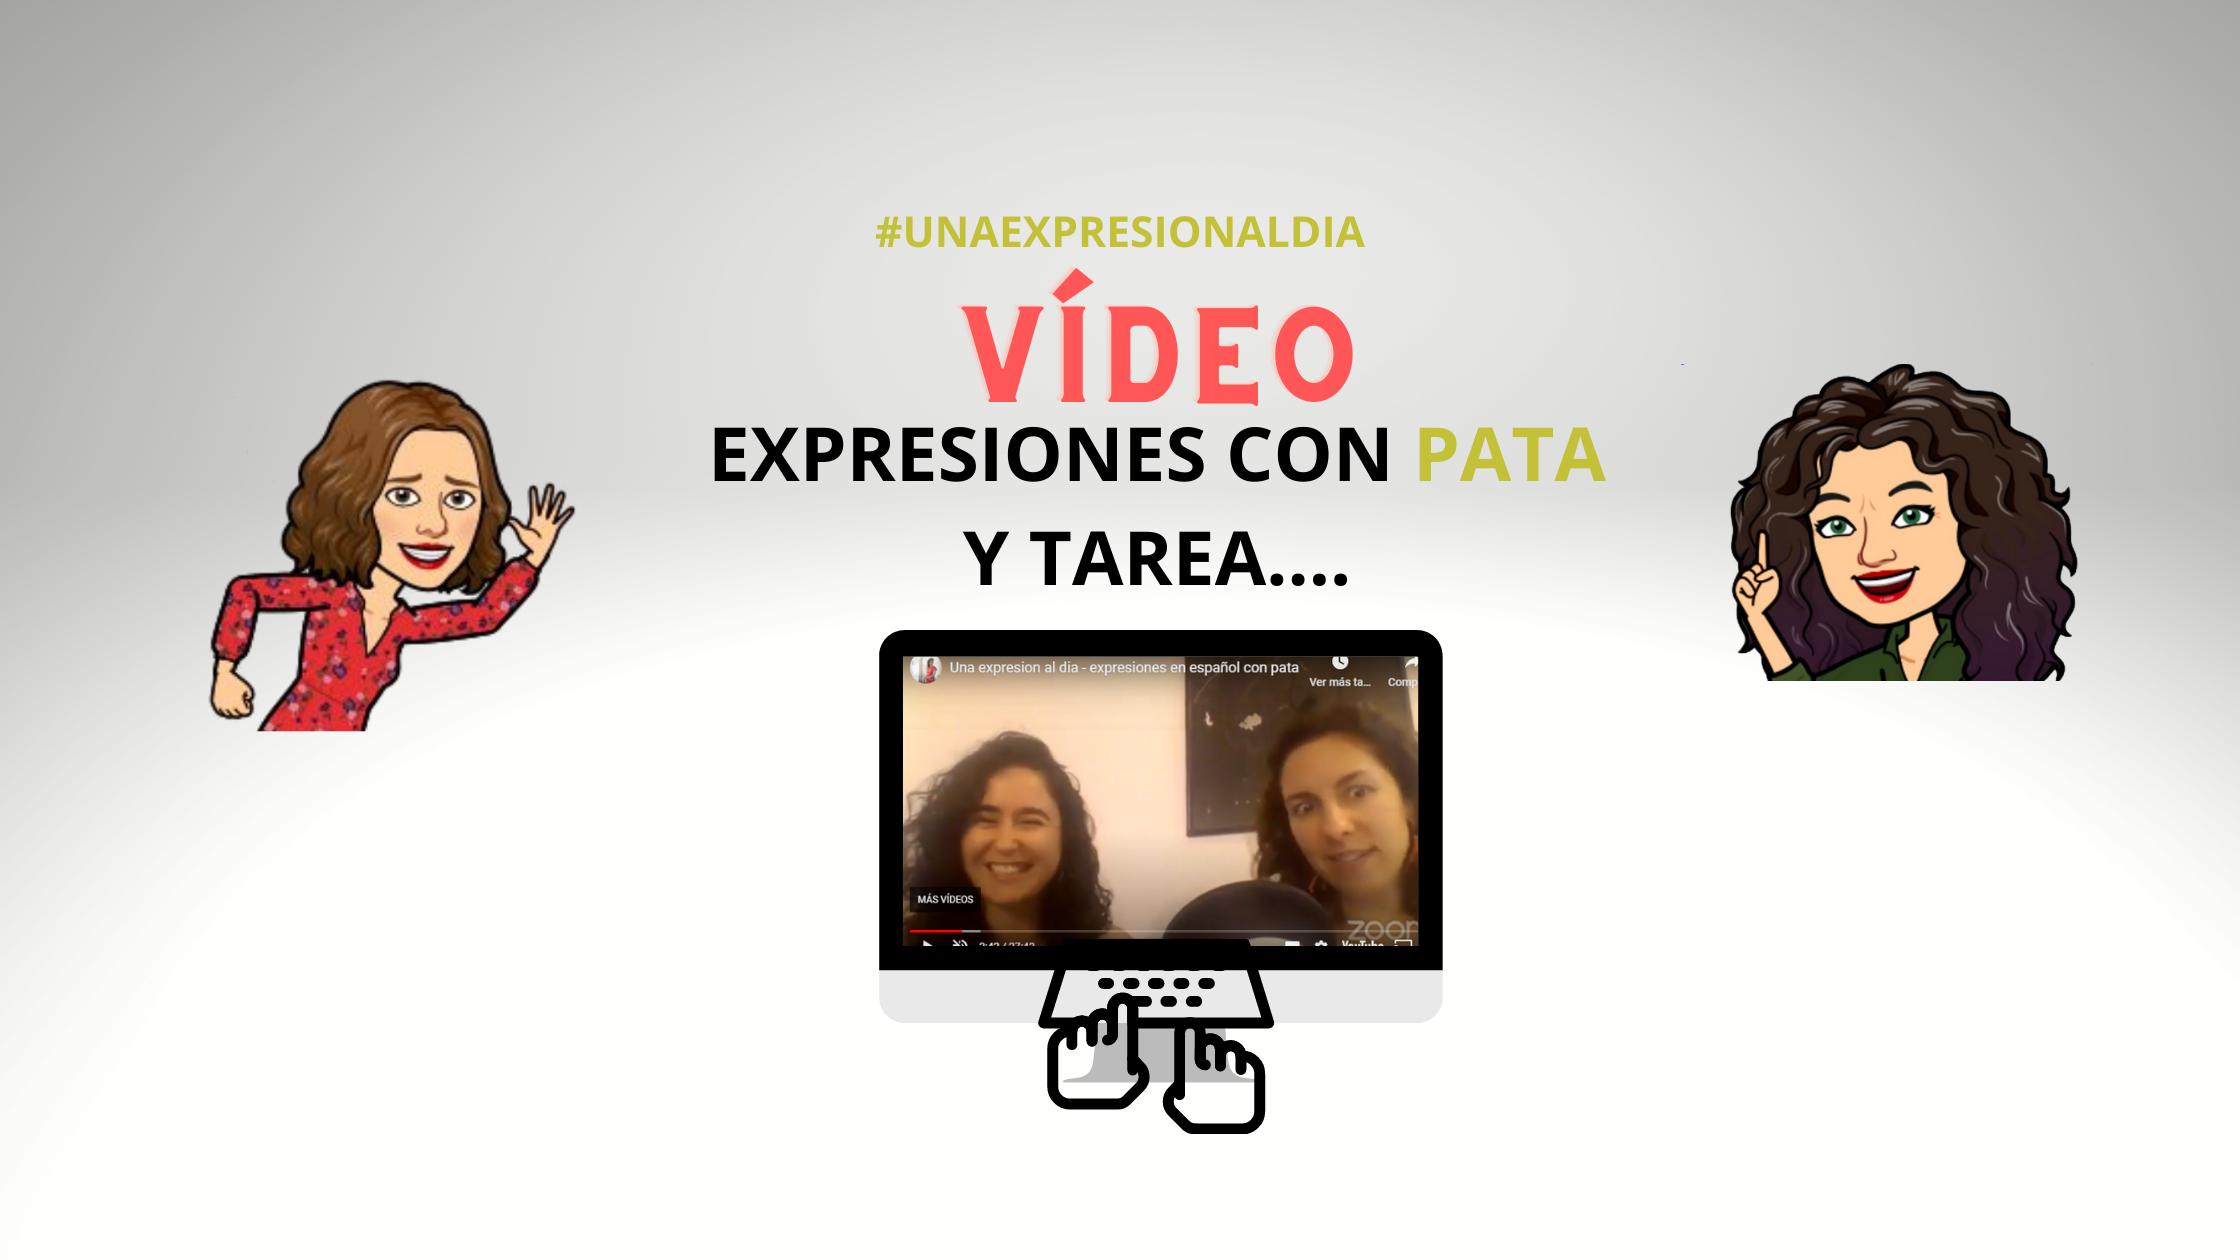 Copy of TAREA UNA EXPRESION AL DIA PATA (4)